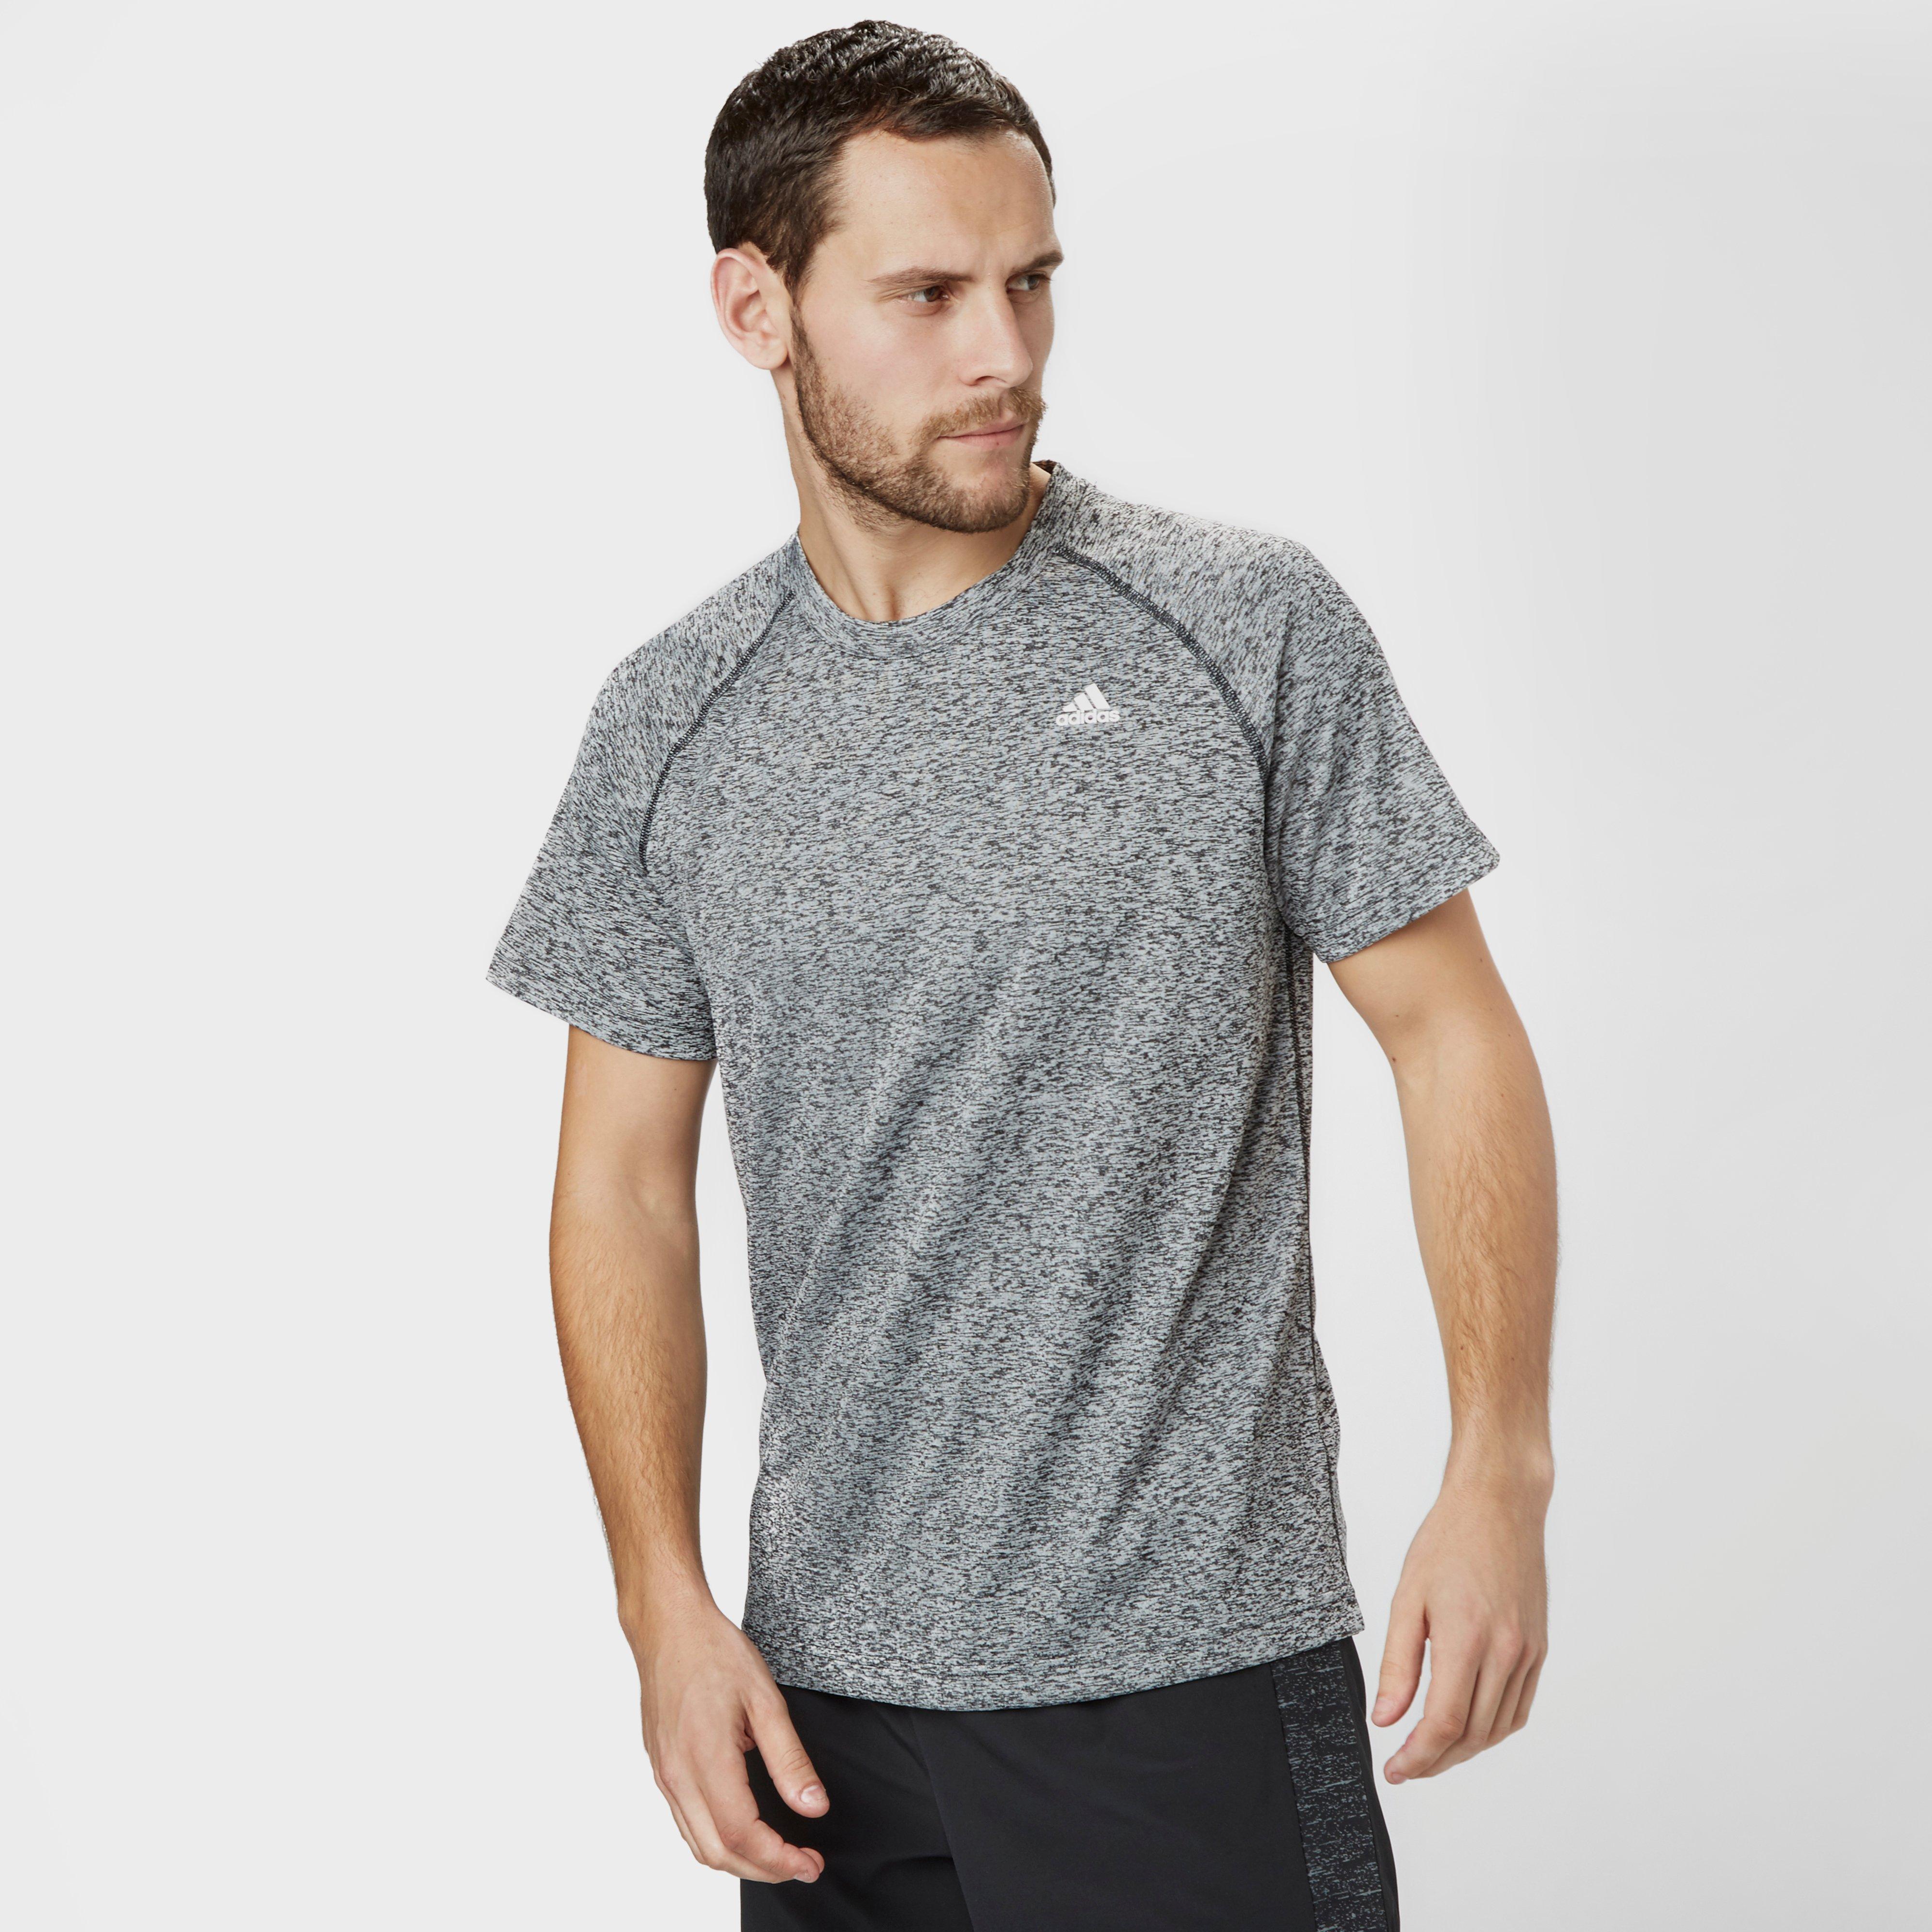 Image of Adidas Men's Baselayer Heathered T-Shirt, Black